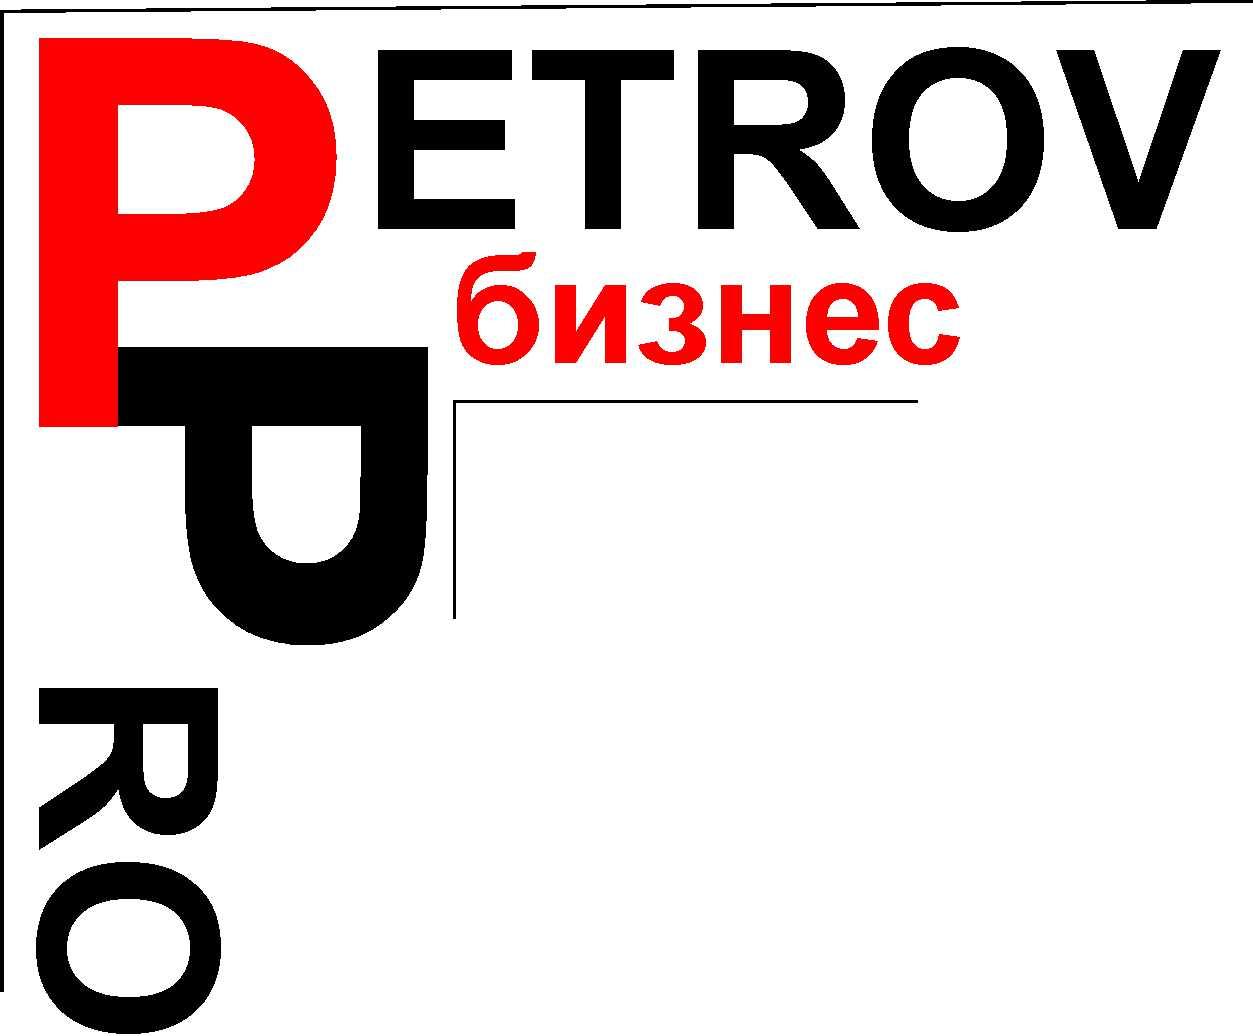 Создать логотип для YouTube канала  фото f_1895bfd12a890aa0.jpg